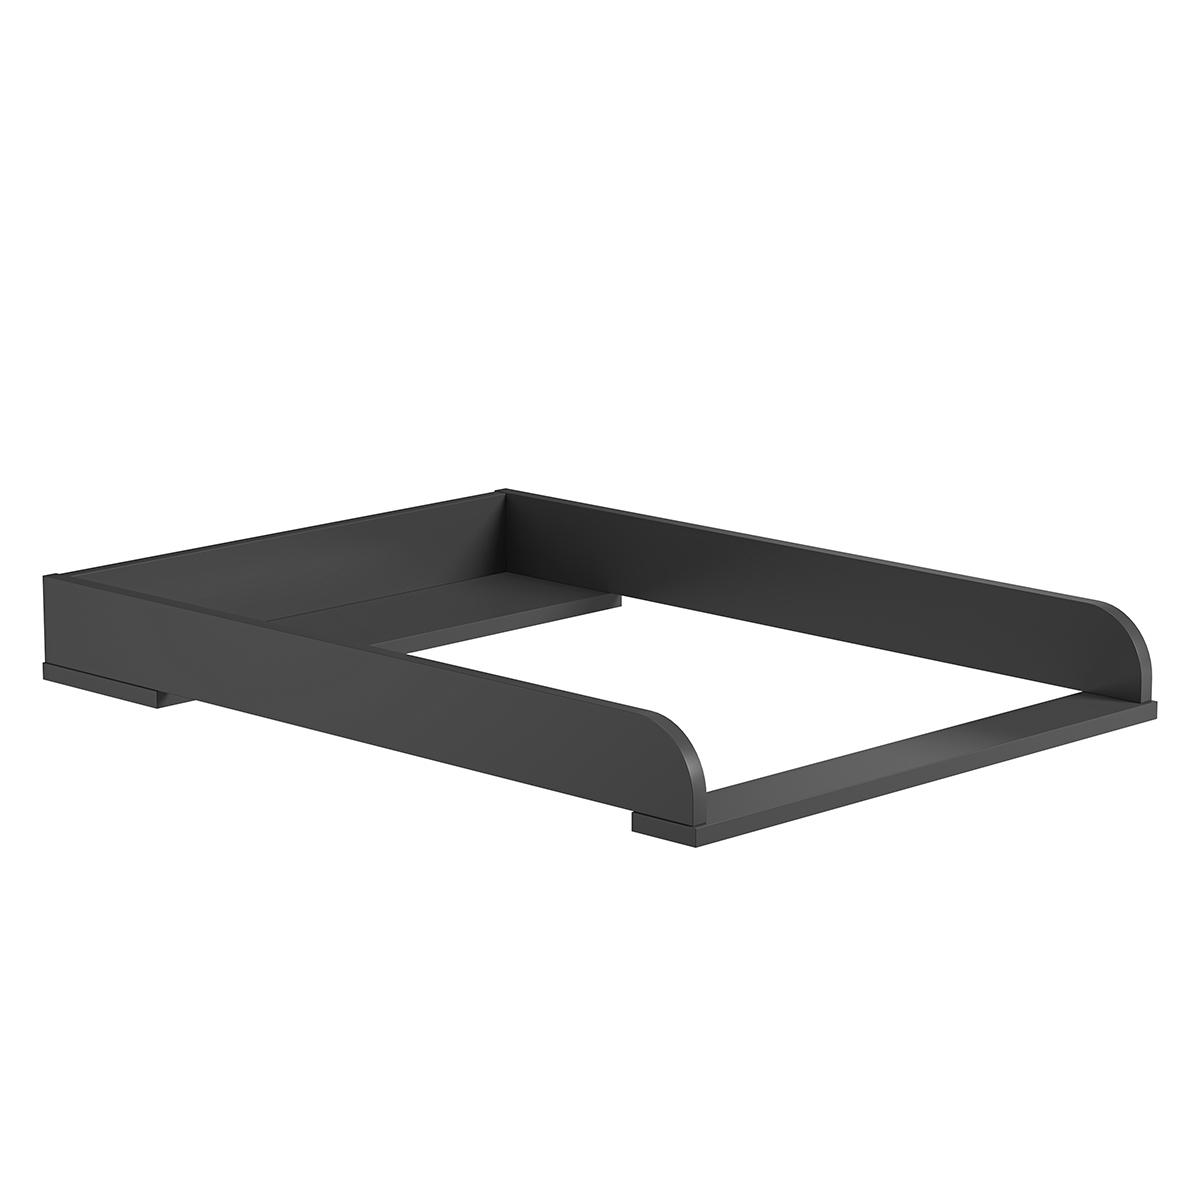 Table à langer Plan à Langer Playwood - Graphite Plan à Langer Playwood - Graphite